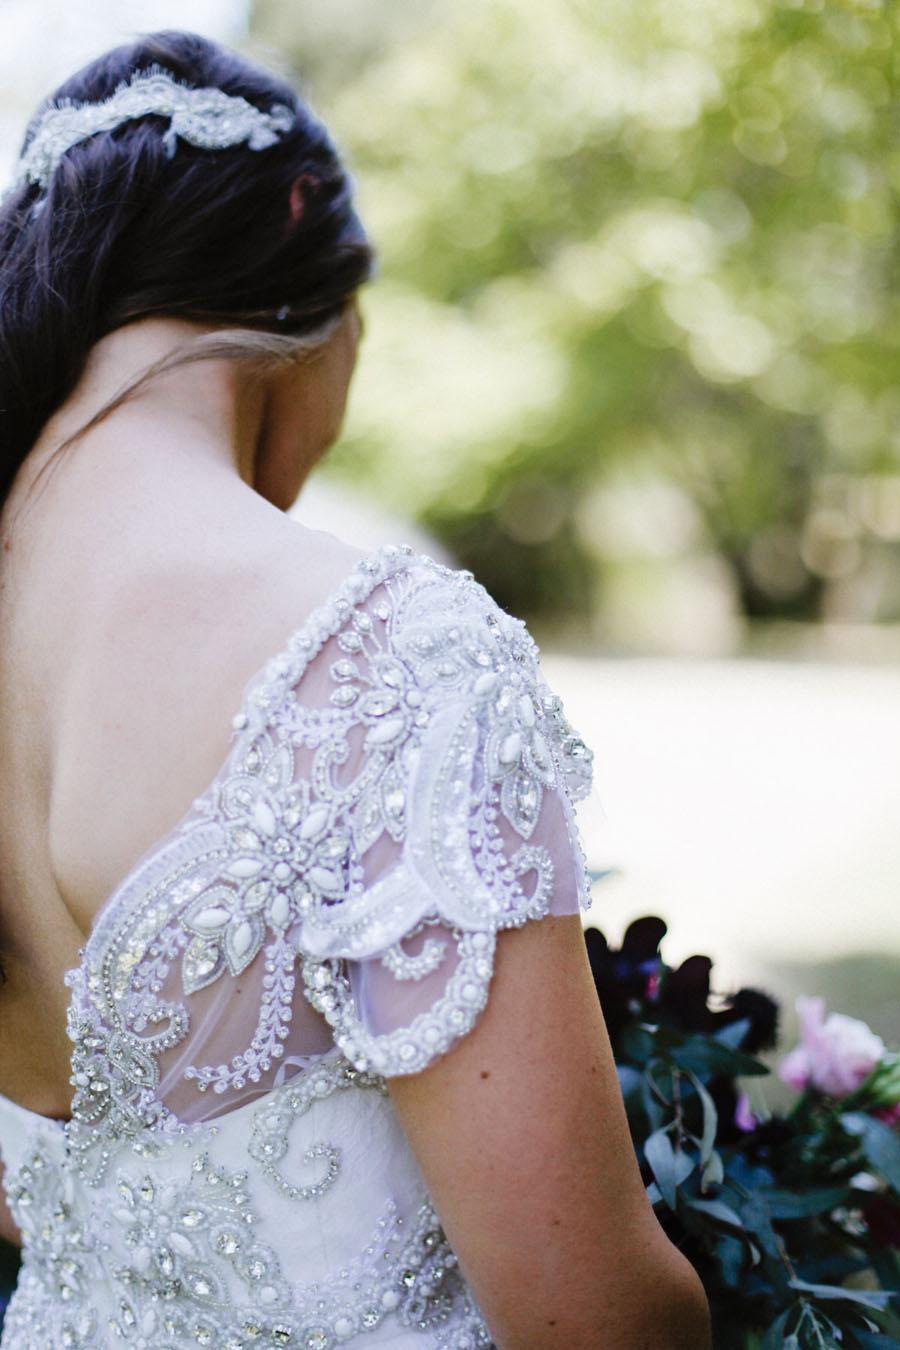 Uncategorized outdoor vintage glam wedding rustic wedding chic - Amazing Wedding Dress Designer Anna Campbell S Rustic Glam Wedding Bridalpulse